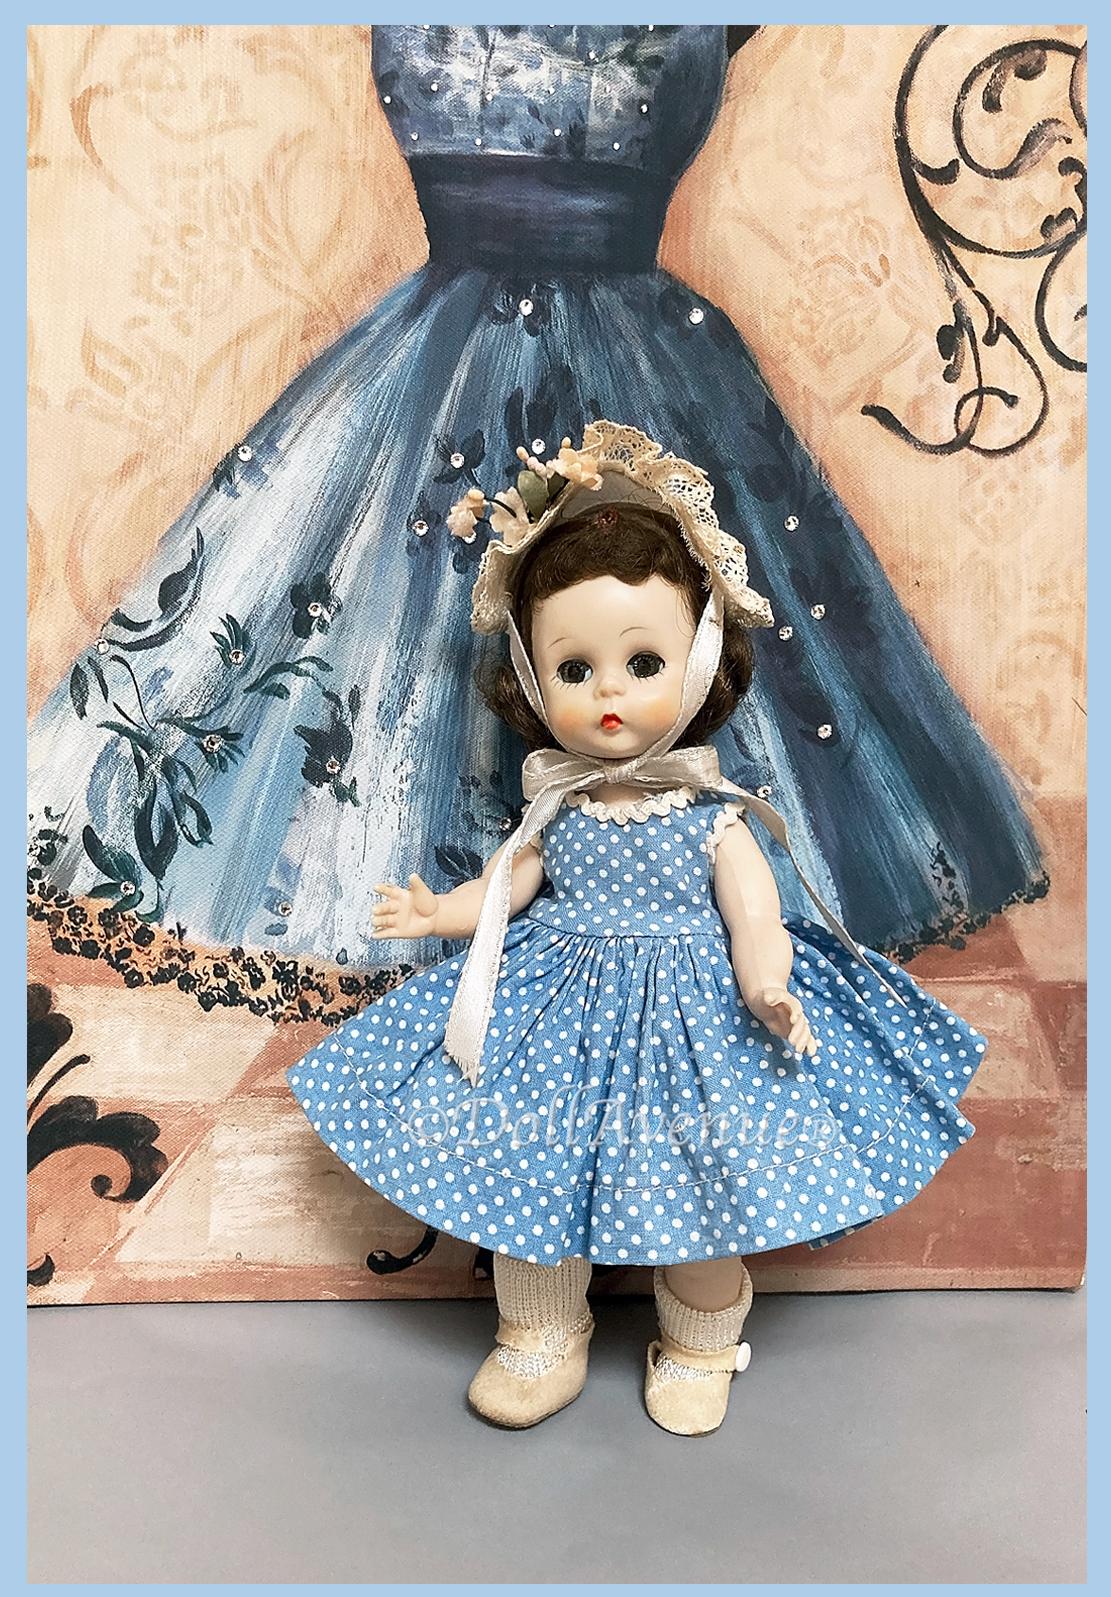 Vintage Alexander-kins in Tagged Dress #453